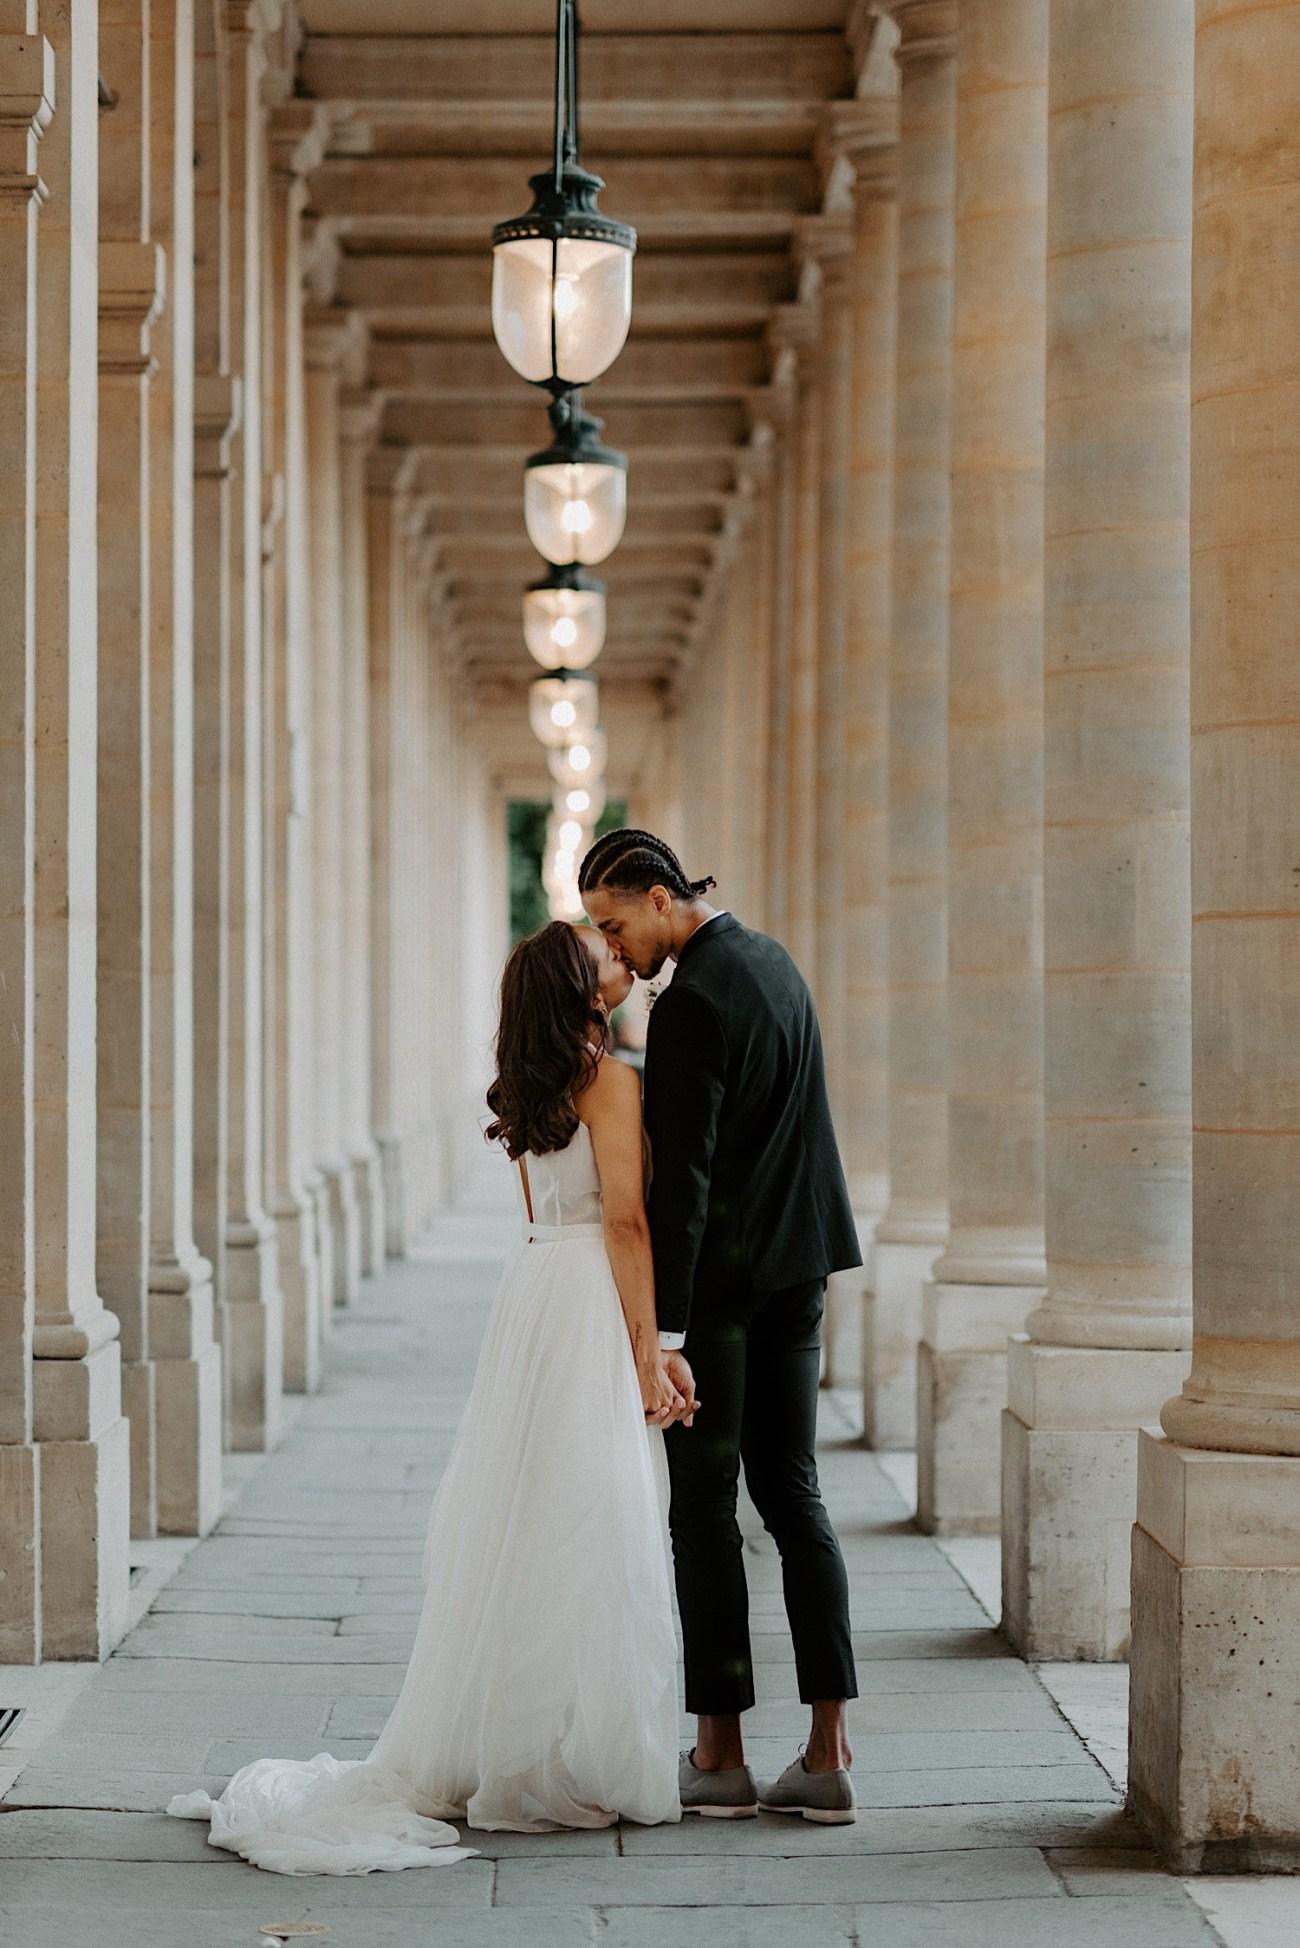 Paris Louvre Wedding Photos Paris Wedding Photographer Destination Wedding France Anais Possamai Photography 07